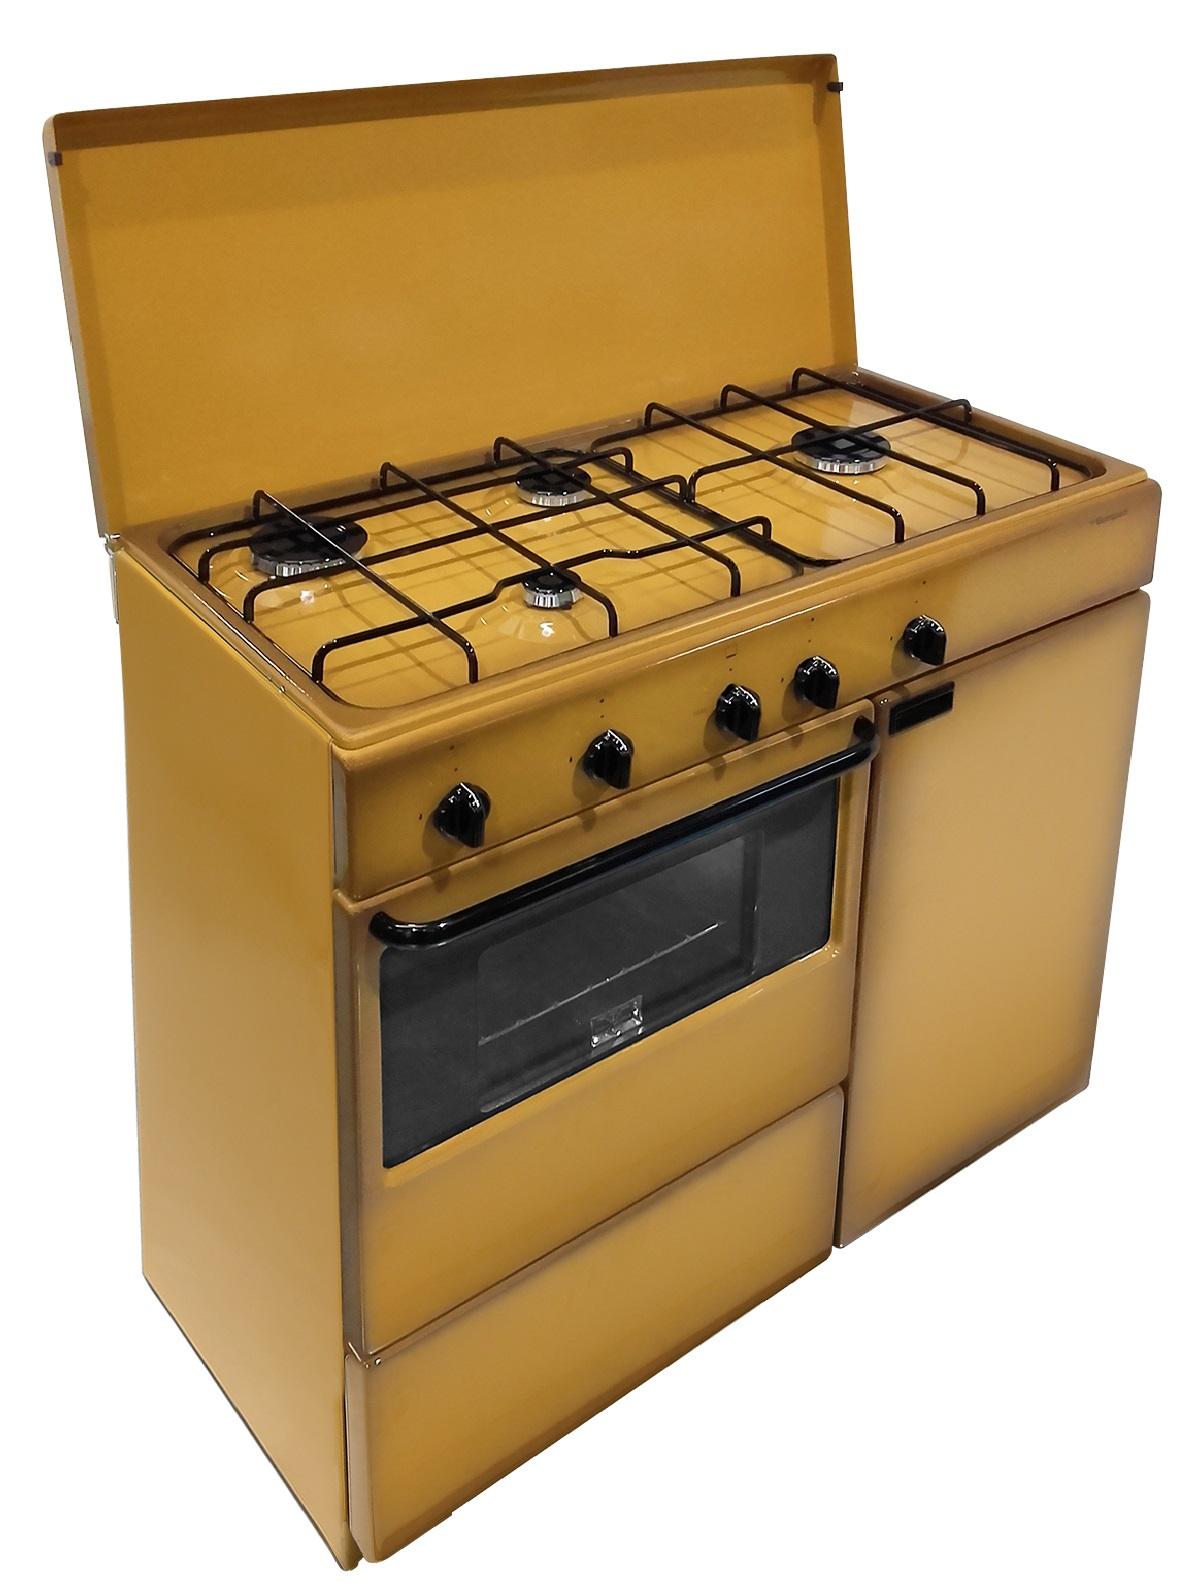 Cucina A Gas Con Portabombola Usata.Dettagli Su Cucina 85x45 Marrone Portabombola Forno Gas Bi961yal Farago